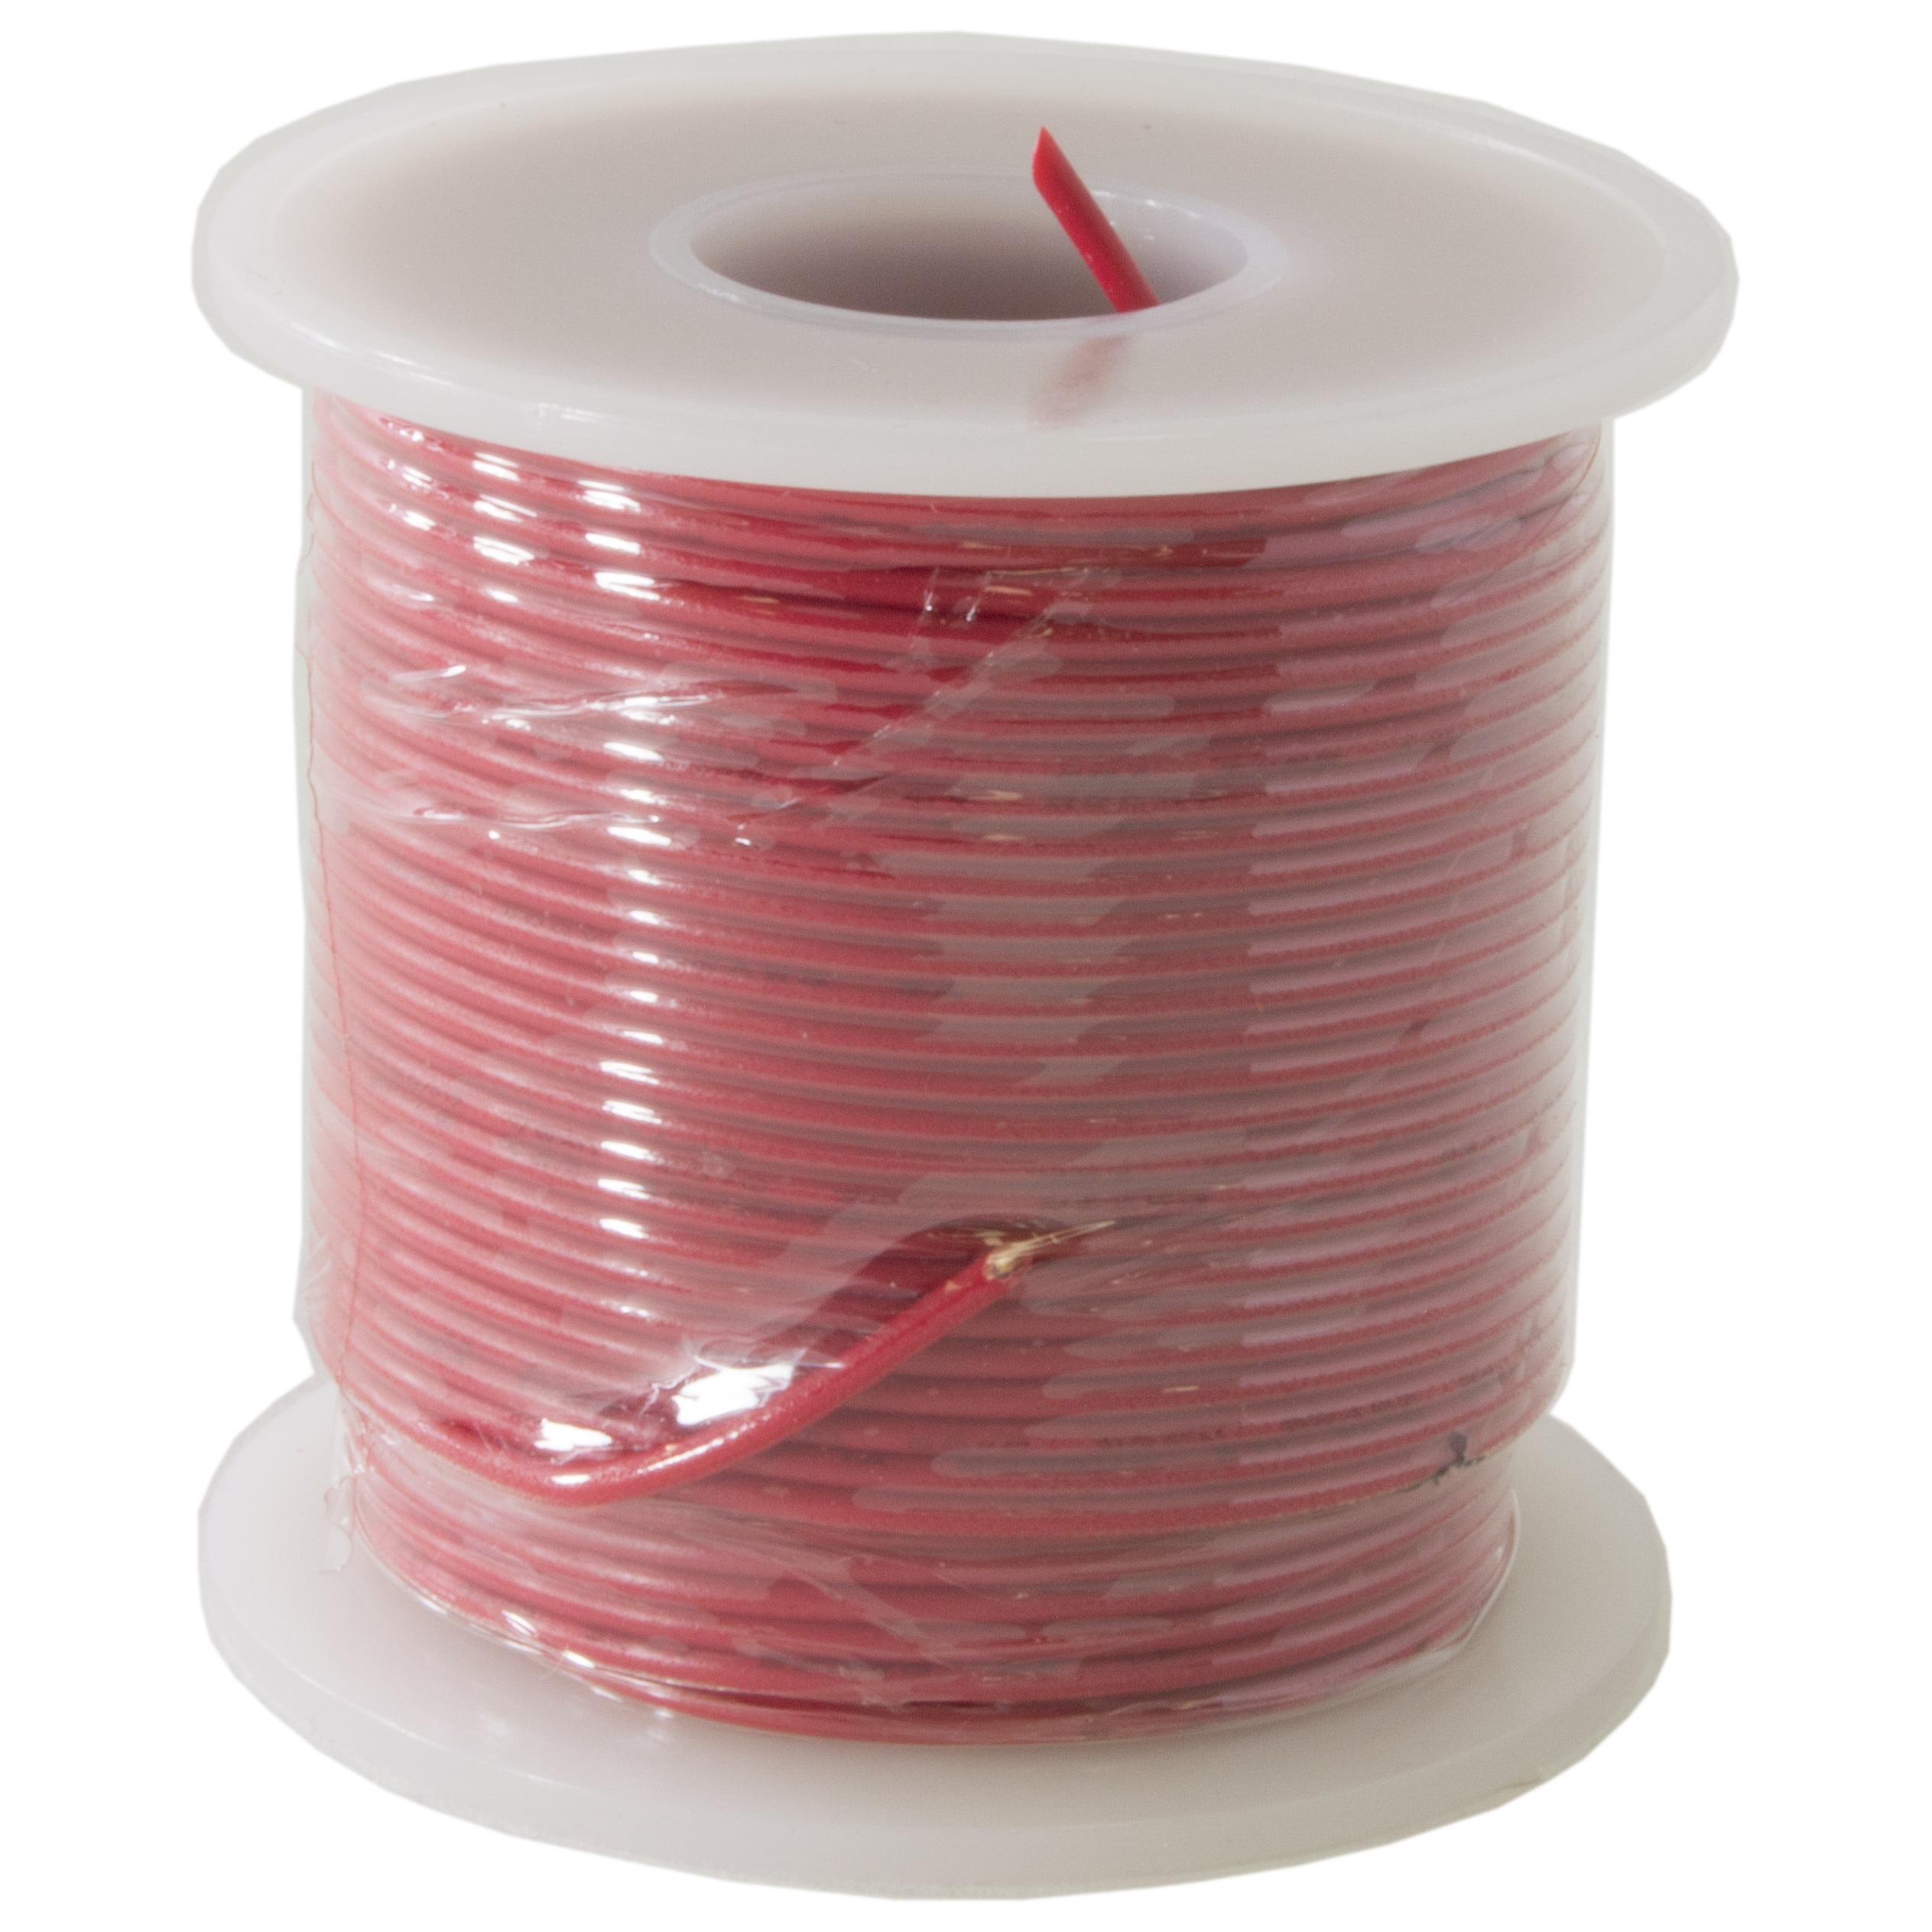 Hook Up Wire 22 Gauge Solid (100' / Red)